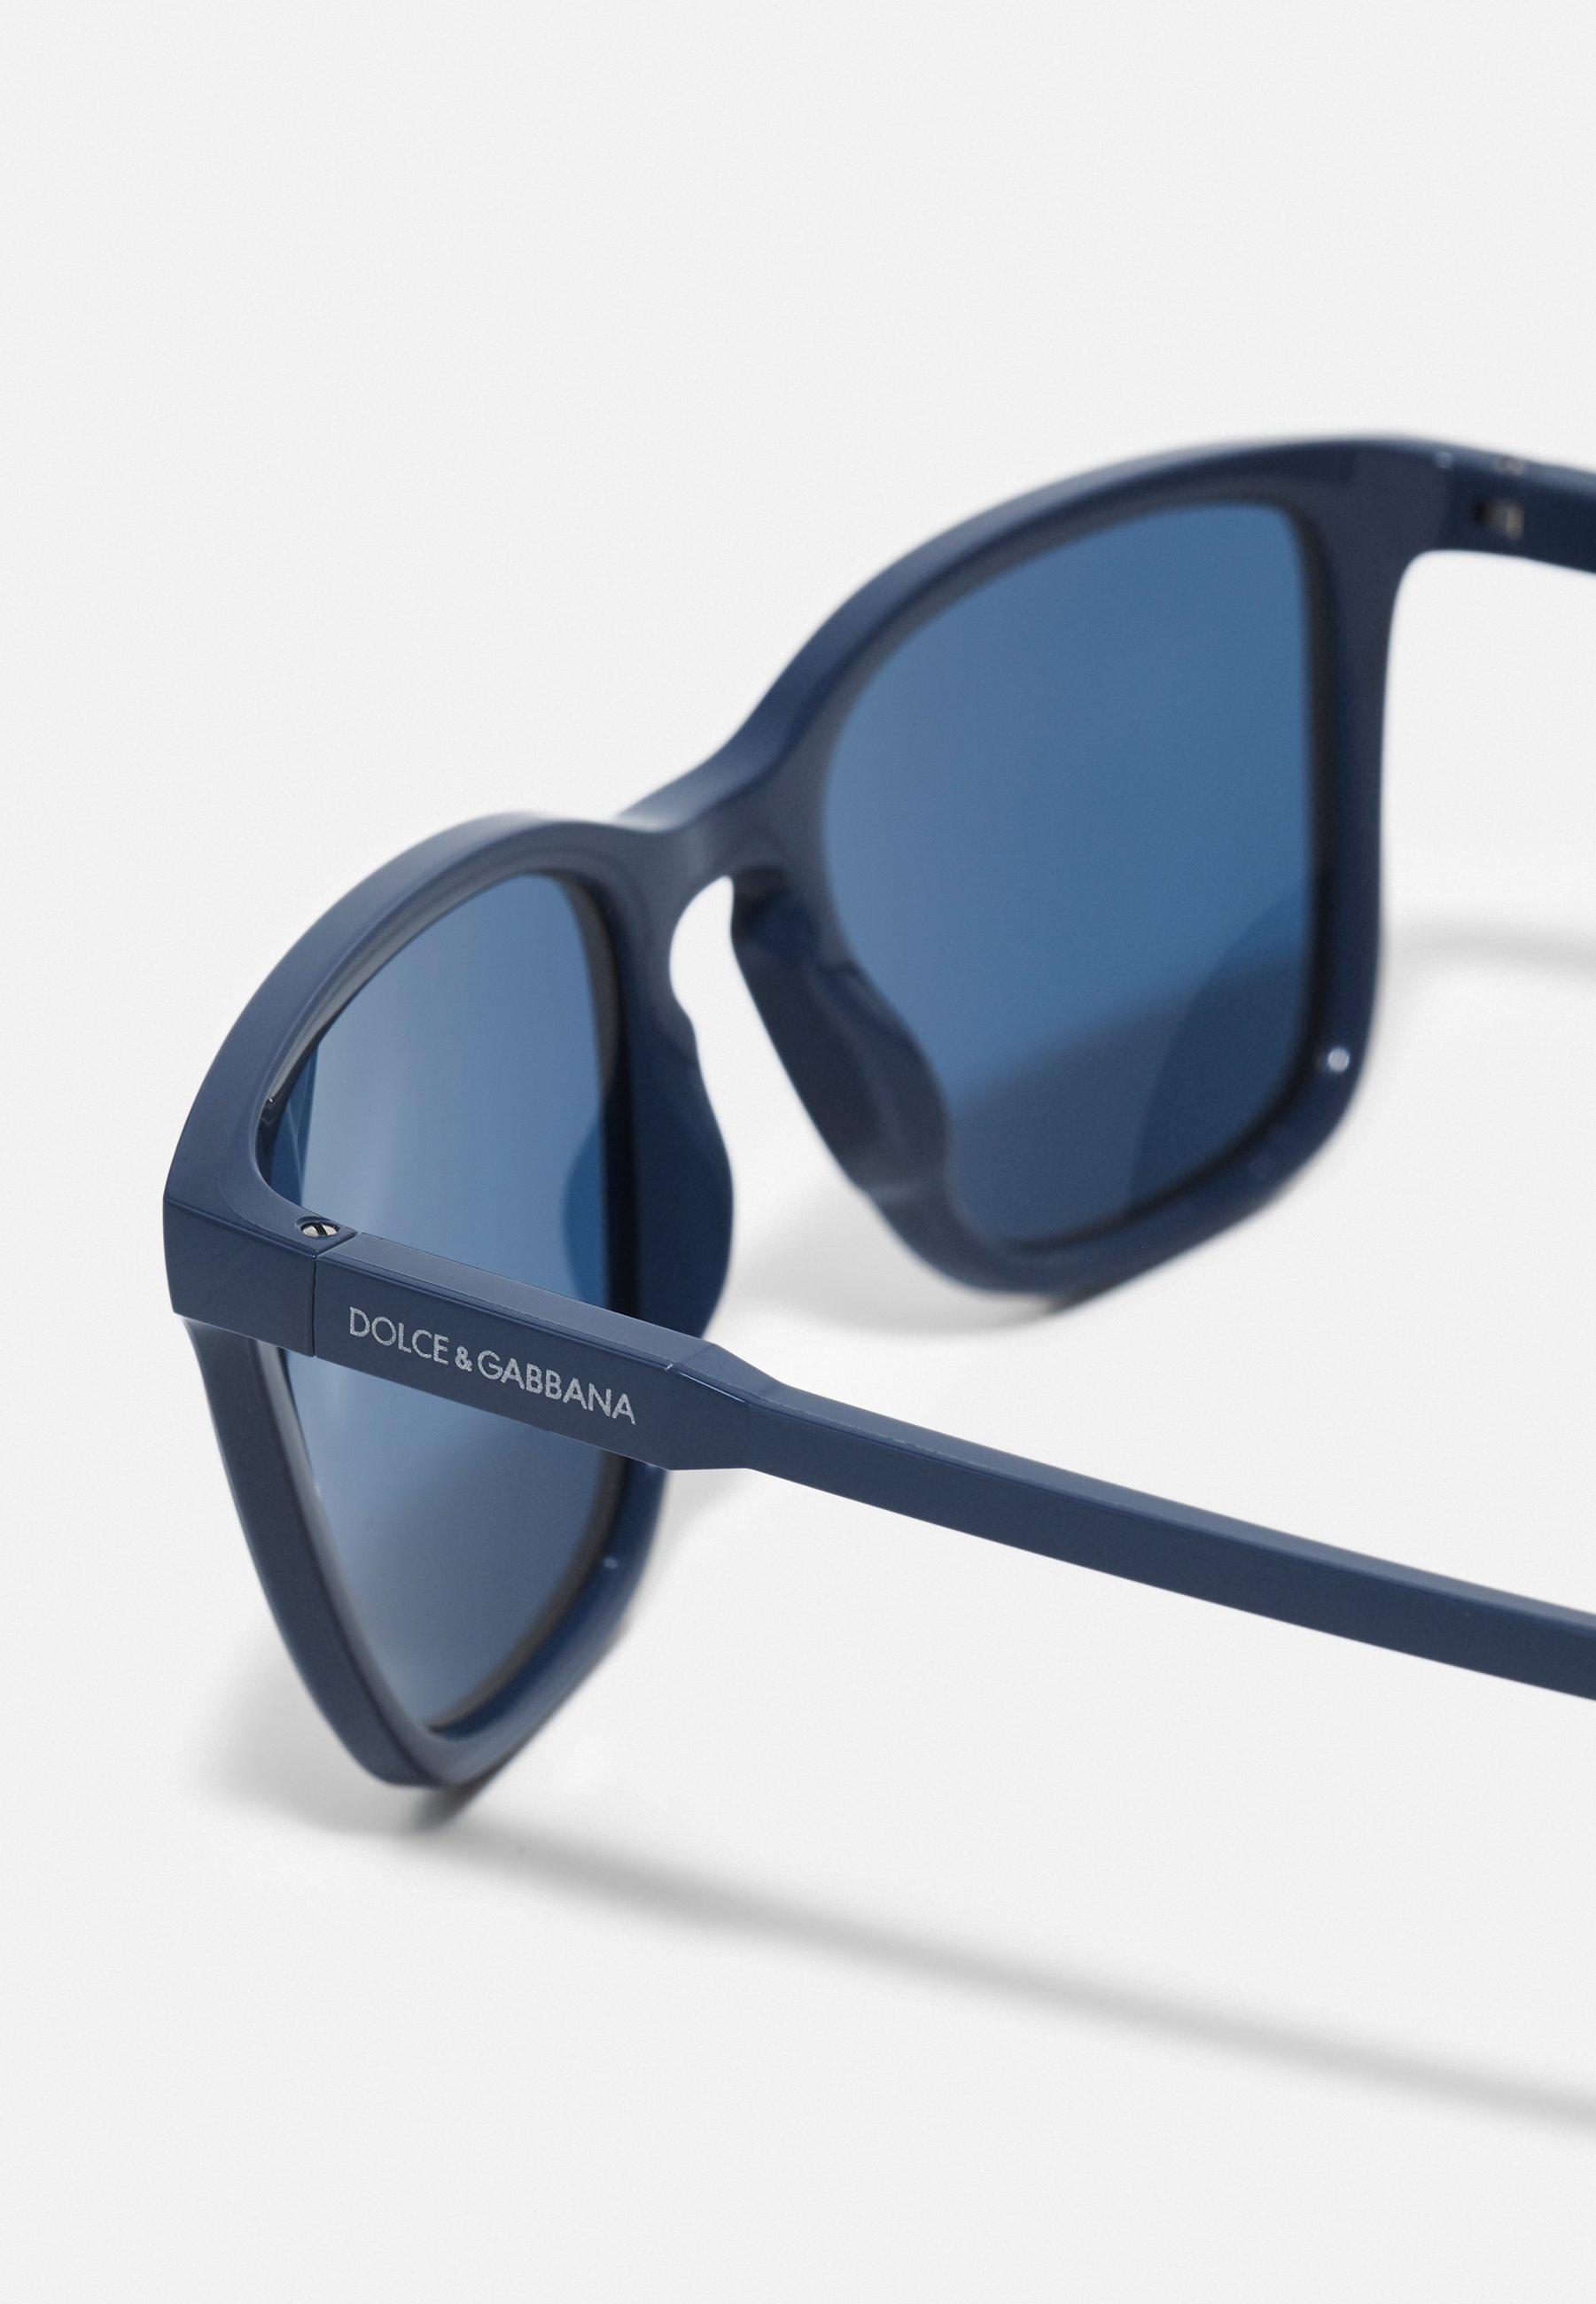 DolceGabbana Sonnenbrille - blue/blau - Herrenaccessoires qObfm